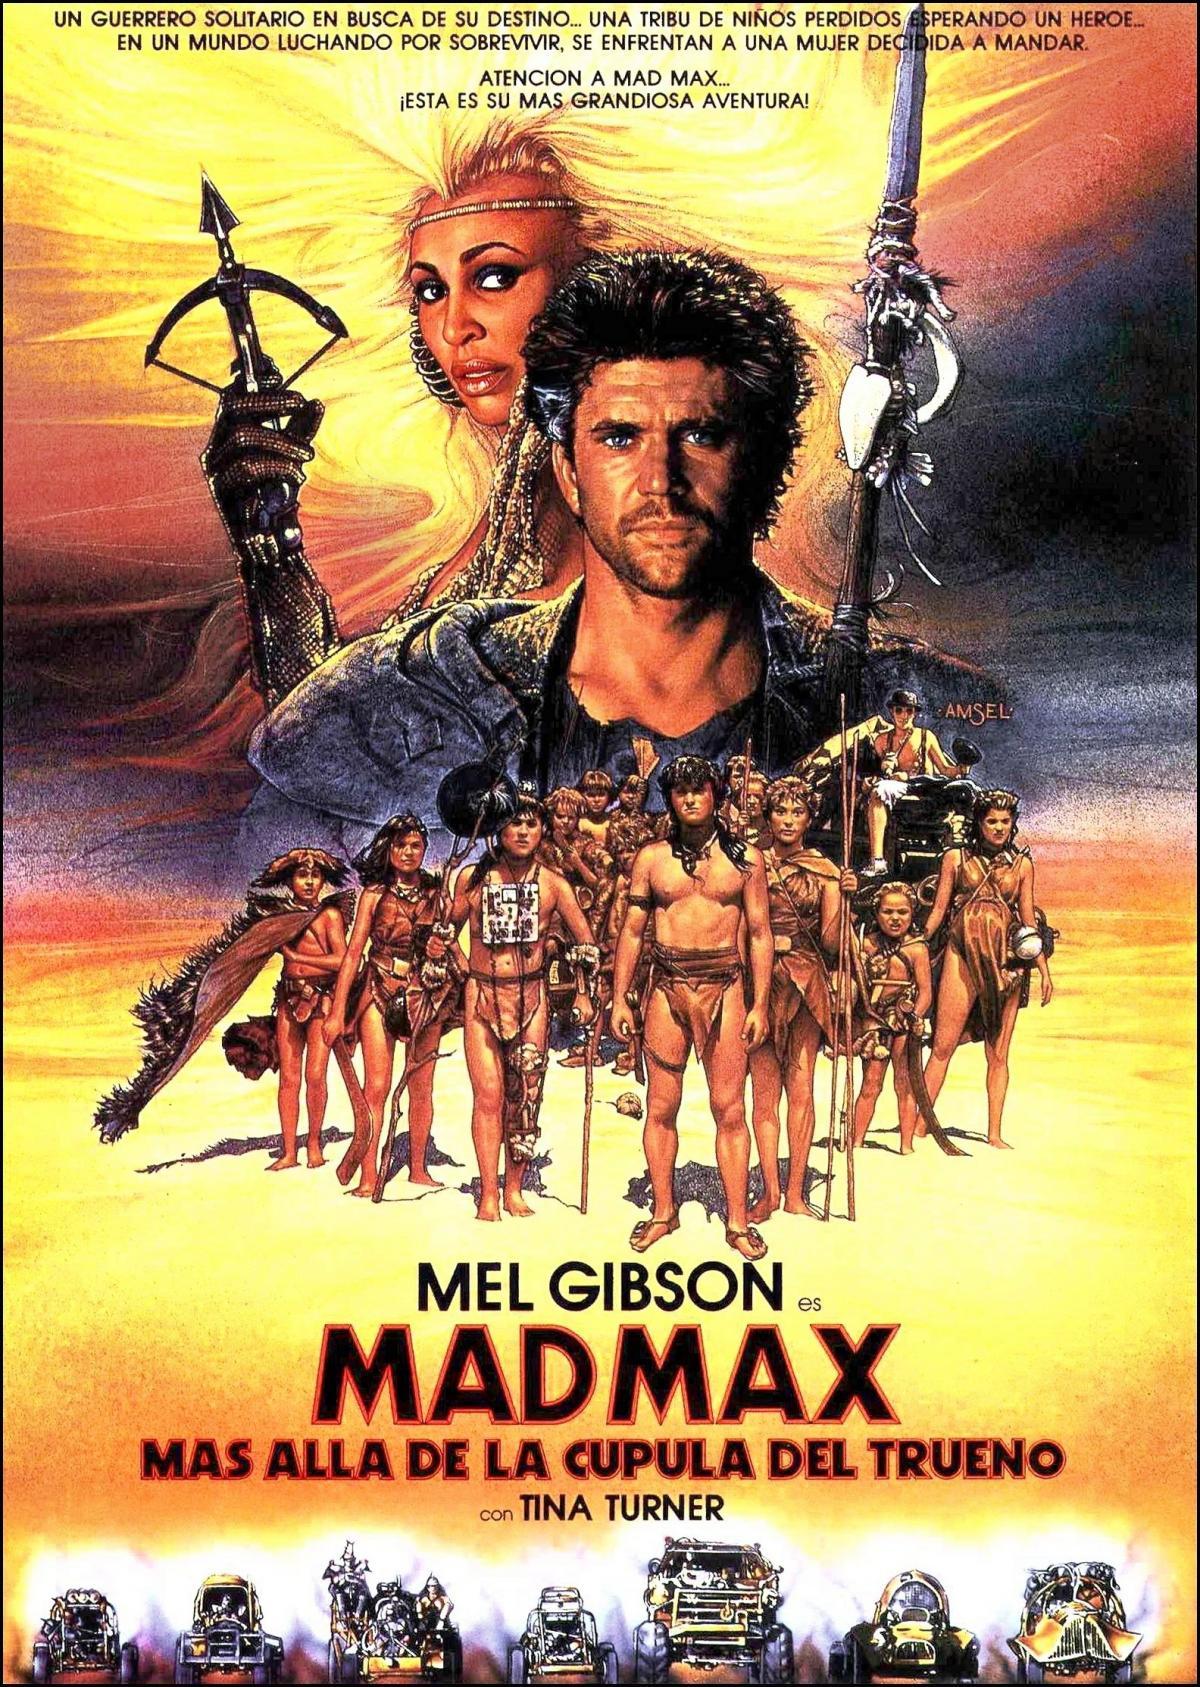 Mad Max Beyond Thunderdome 1985 Hindi Dual Audio 480p BluRay 380MB Download